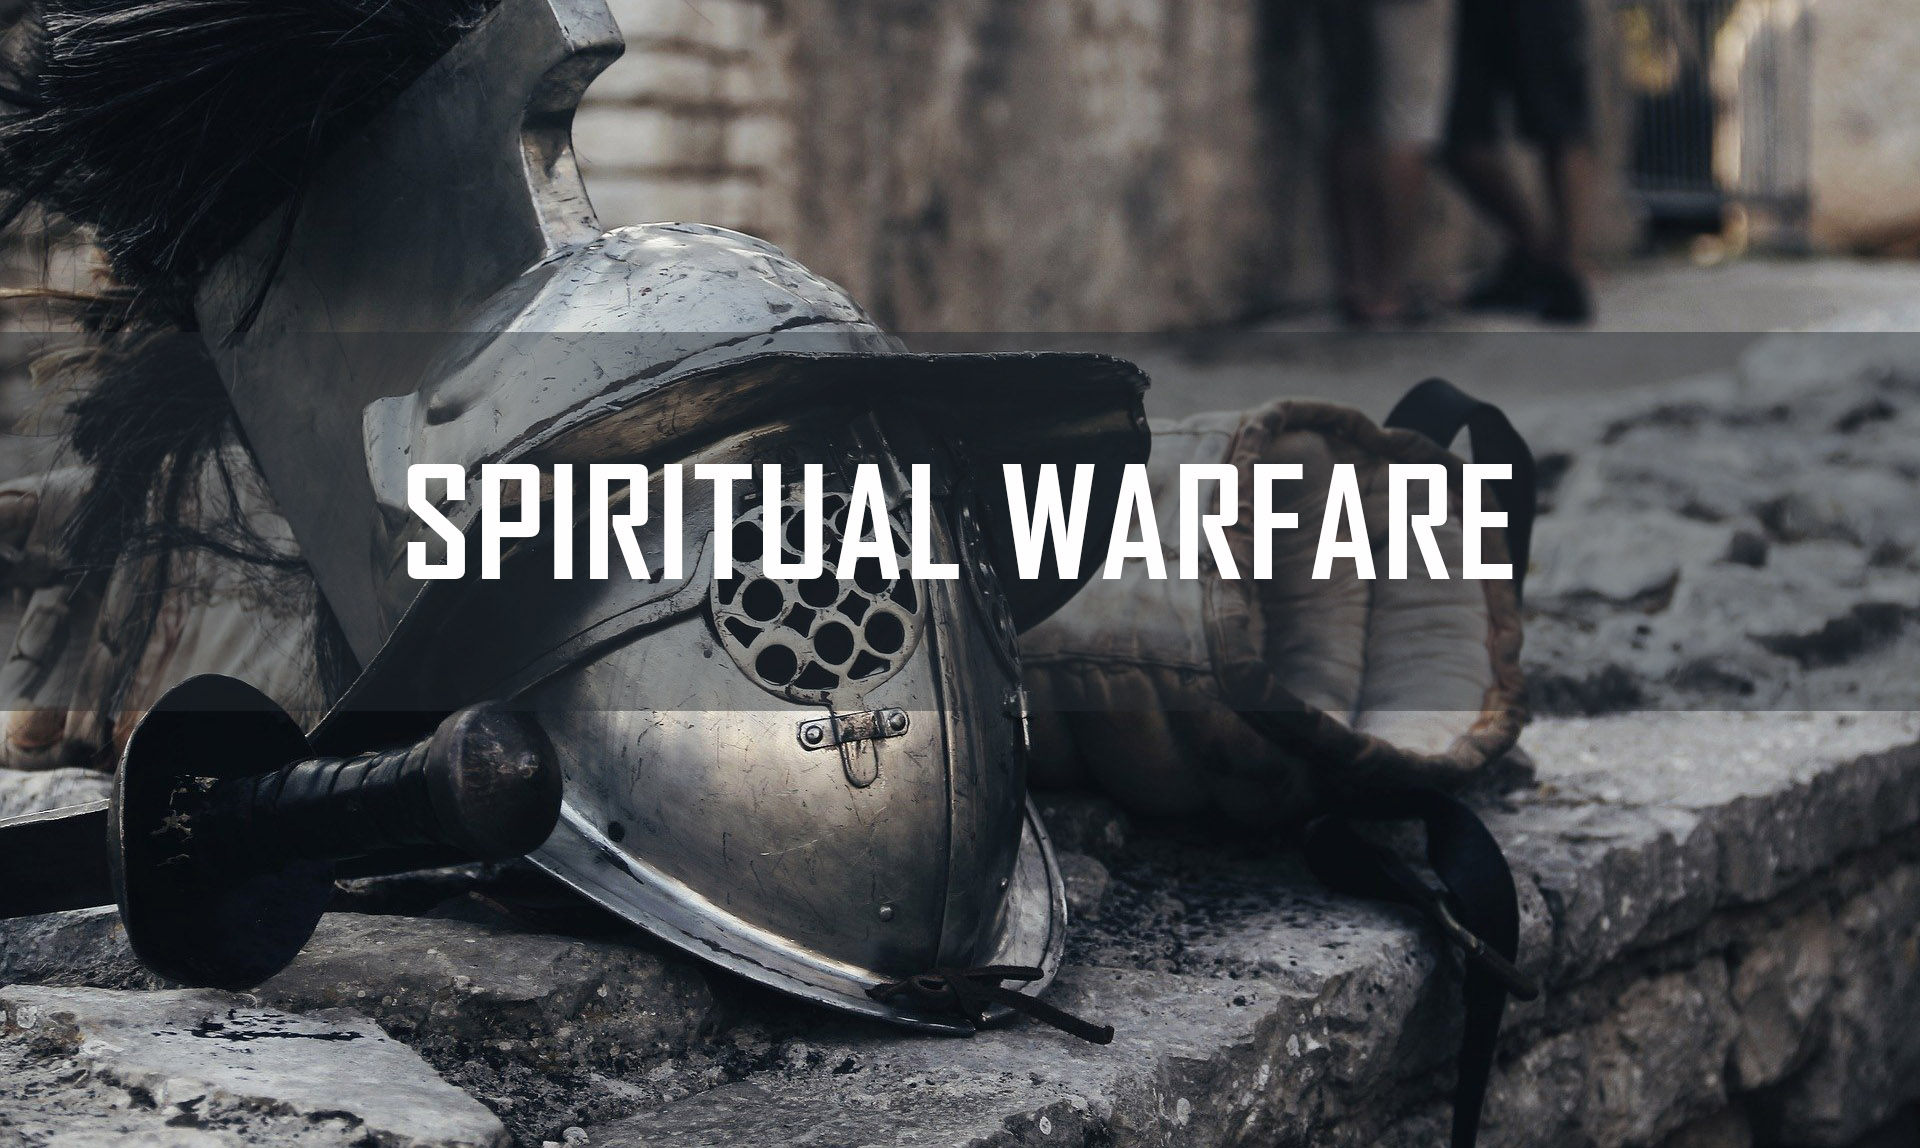 SPIRITUAL WARFARE <BR/> NICHOLAS PEREIRA